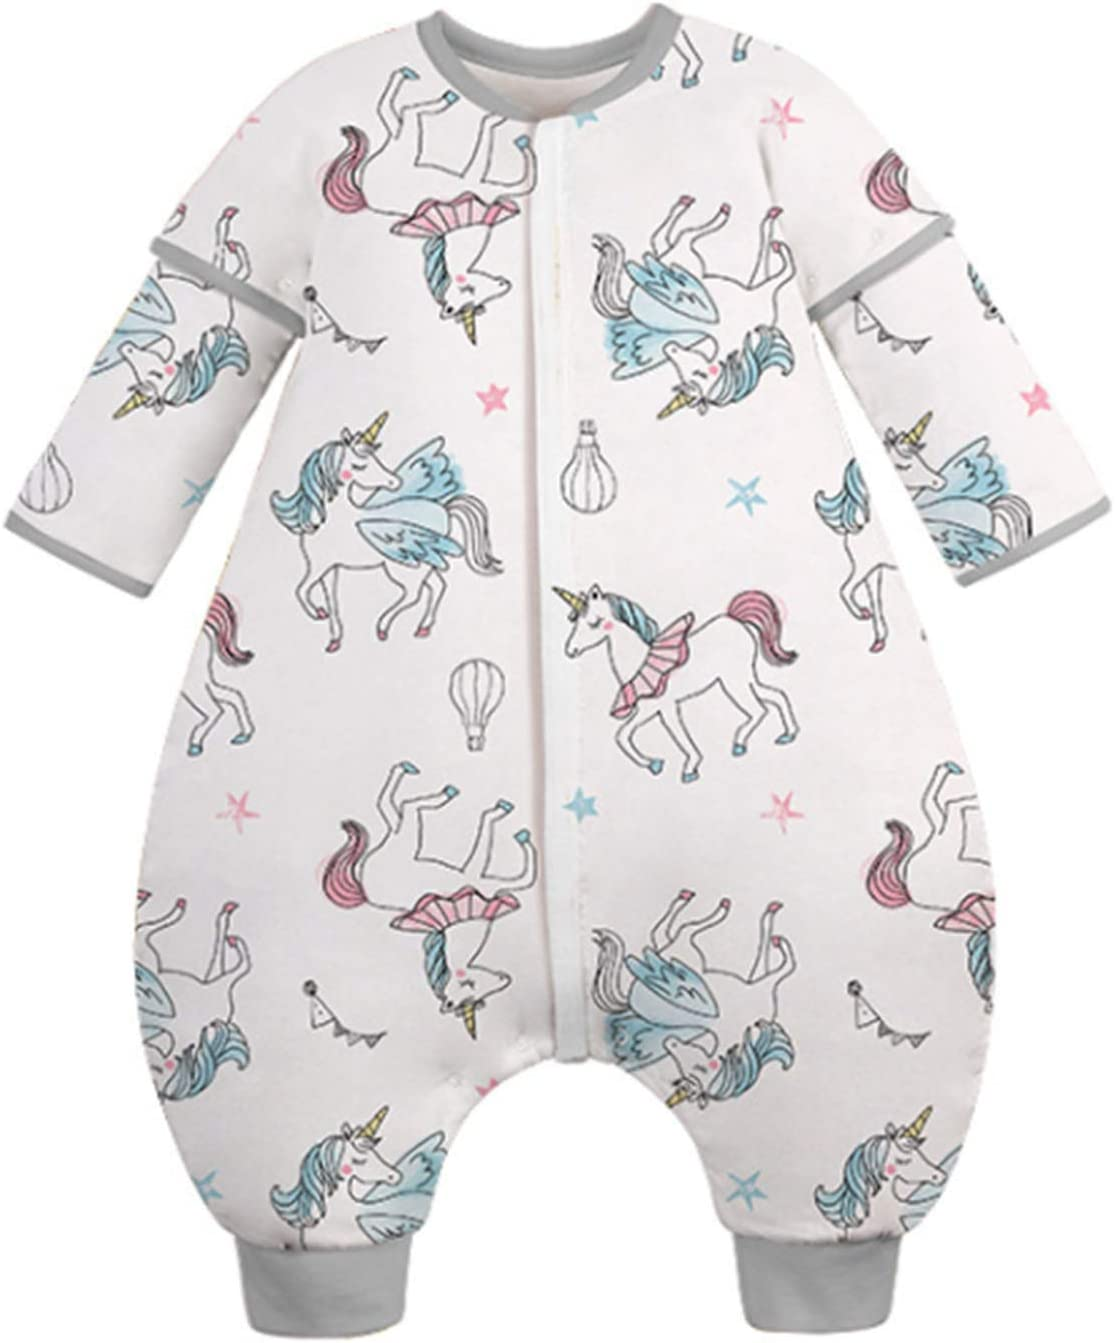 UUHOME Wearable Blanket Max Max 76% OFF 49% OFF Cotton Sleeping Trans Sack Newborn Bag